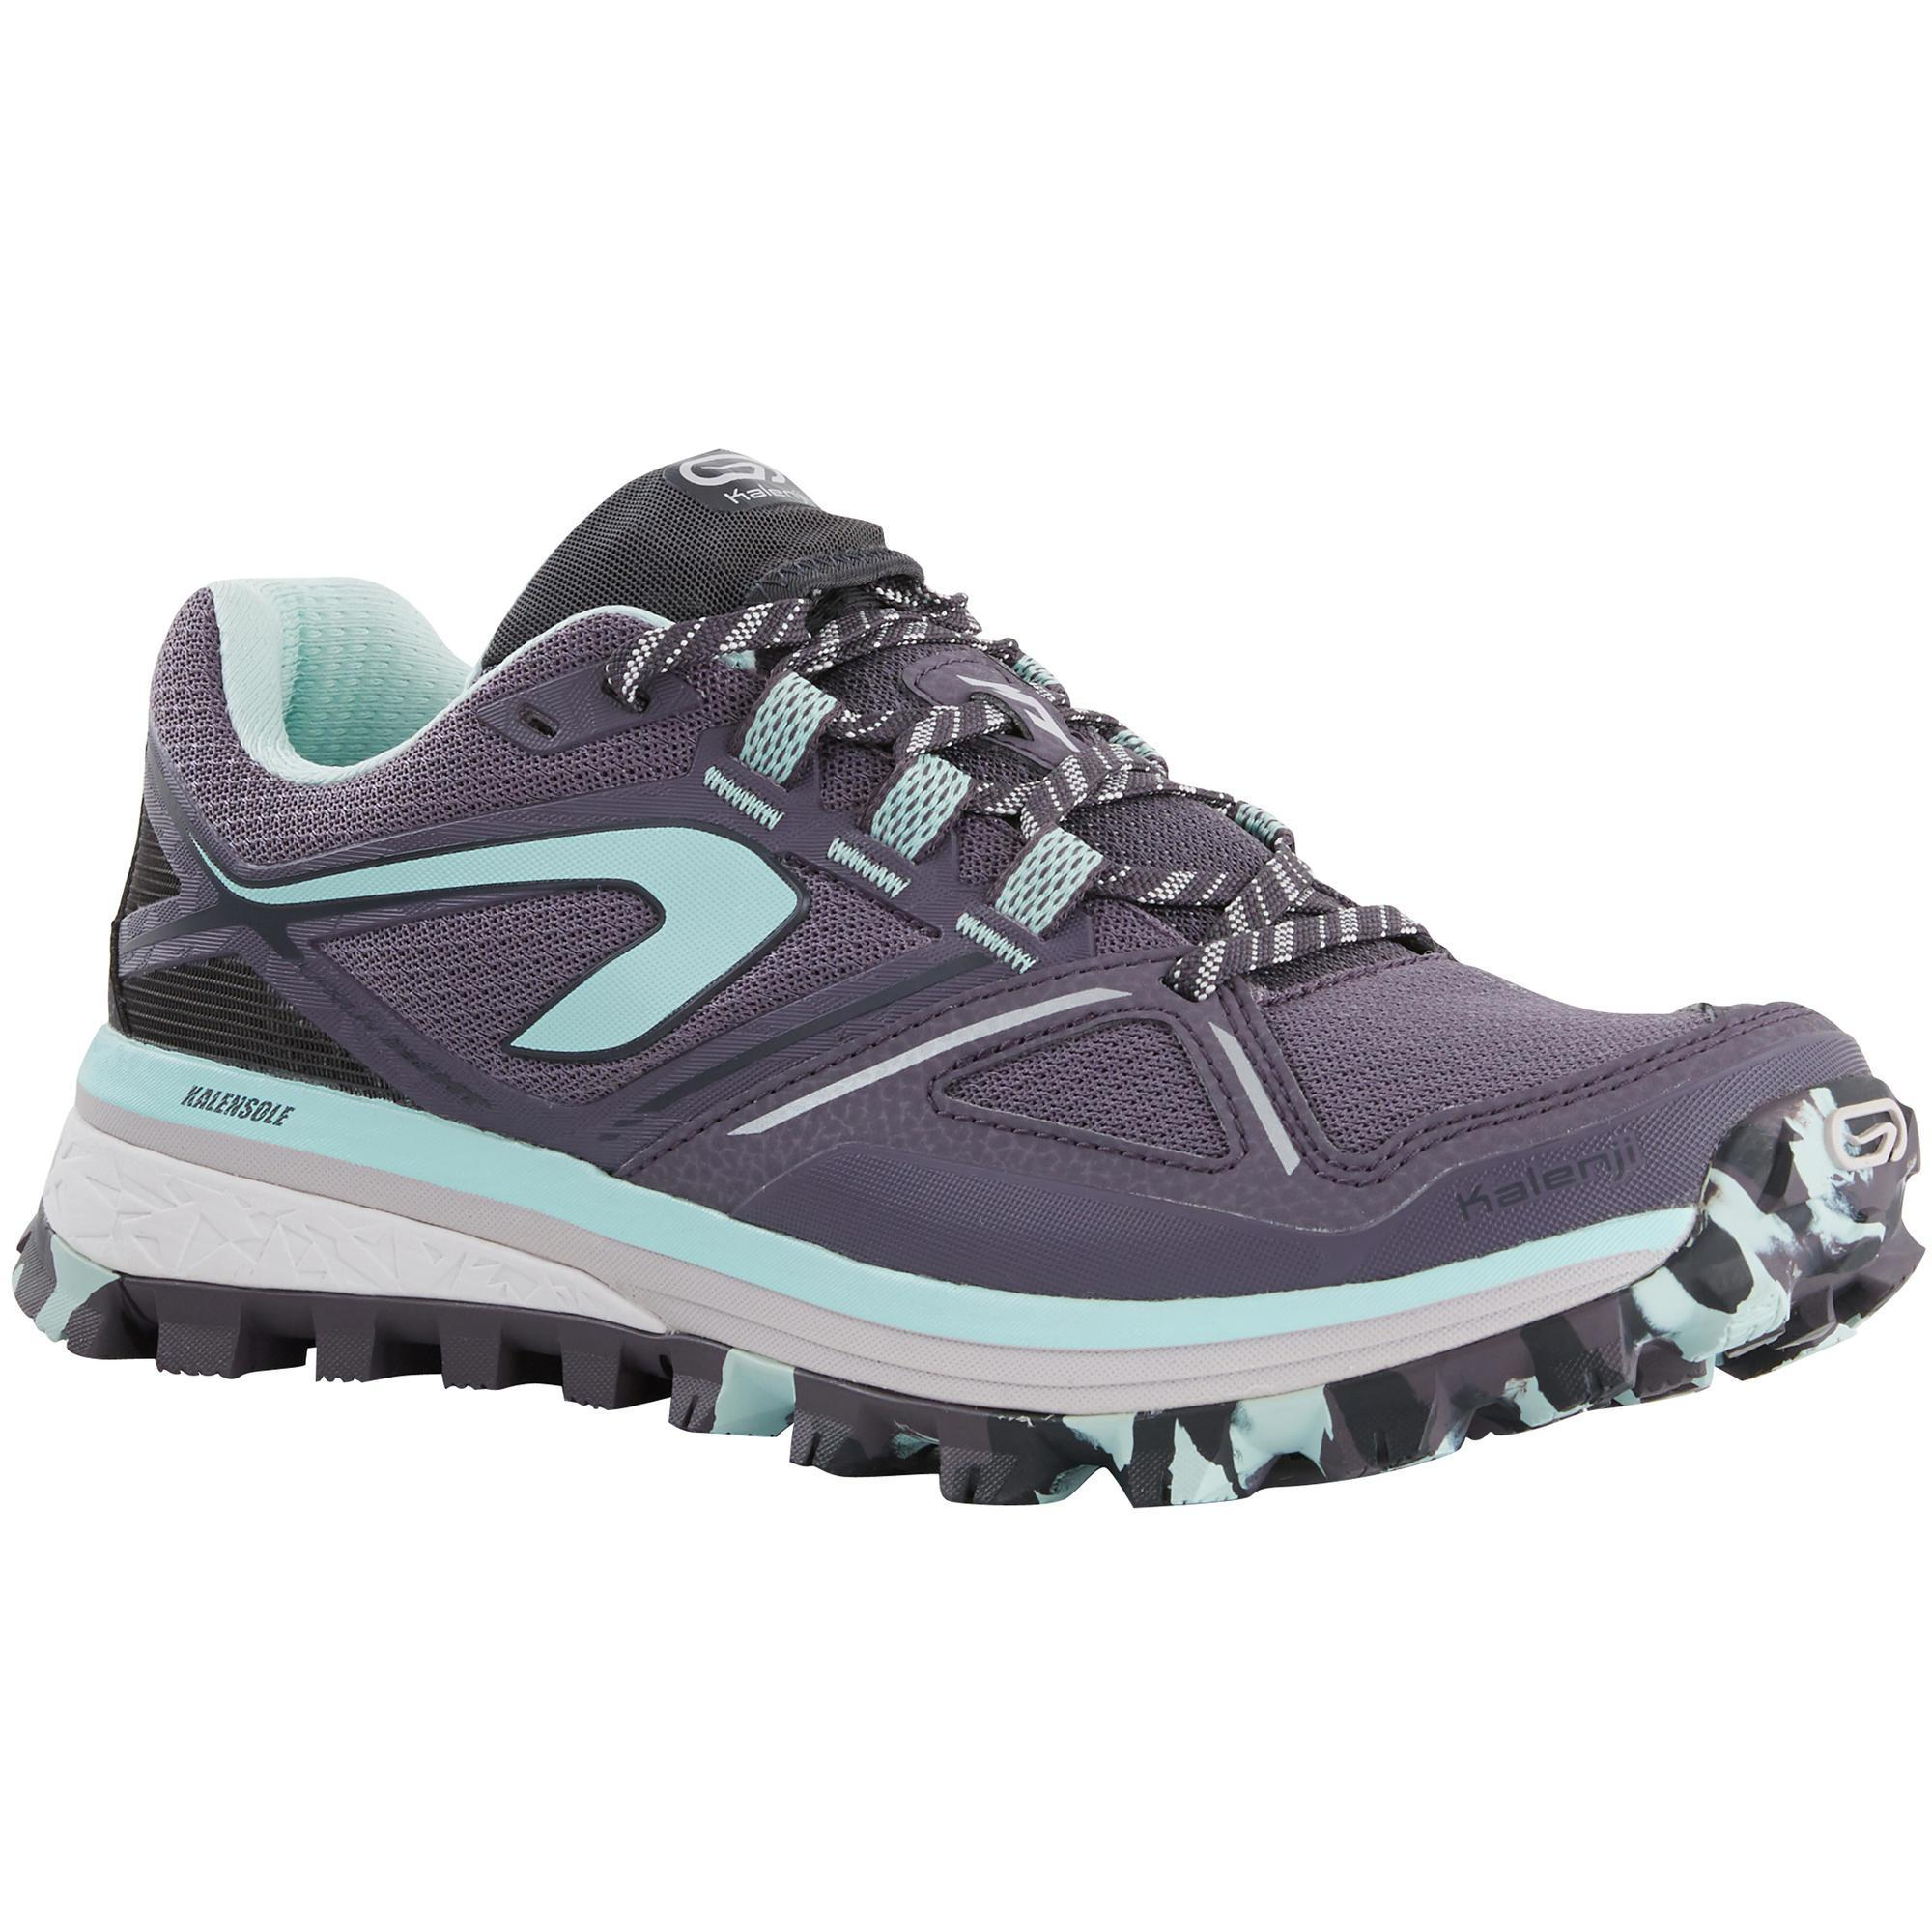 Kalenji Trailschoenen voor dames Kiprun Trail MT paars/blauw